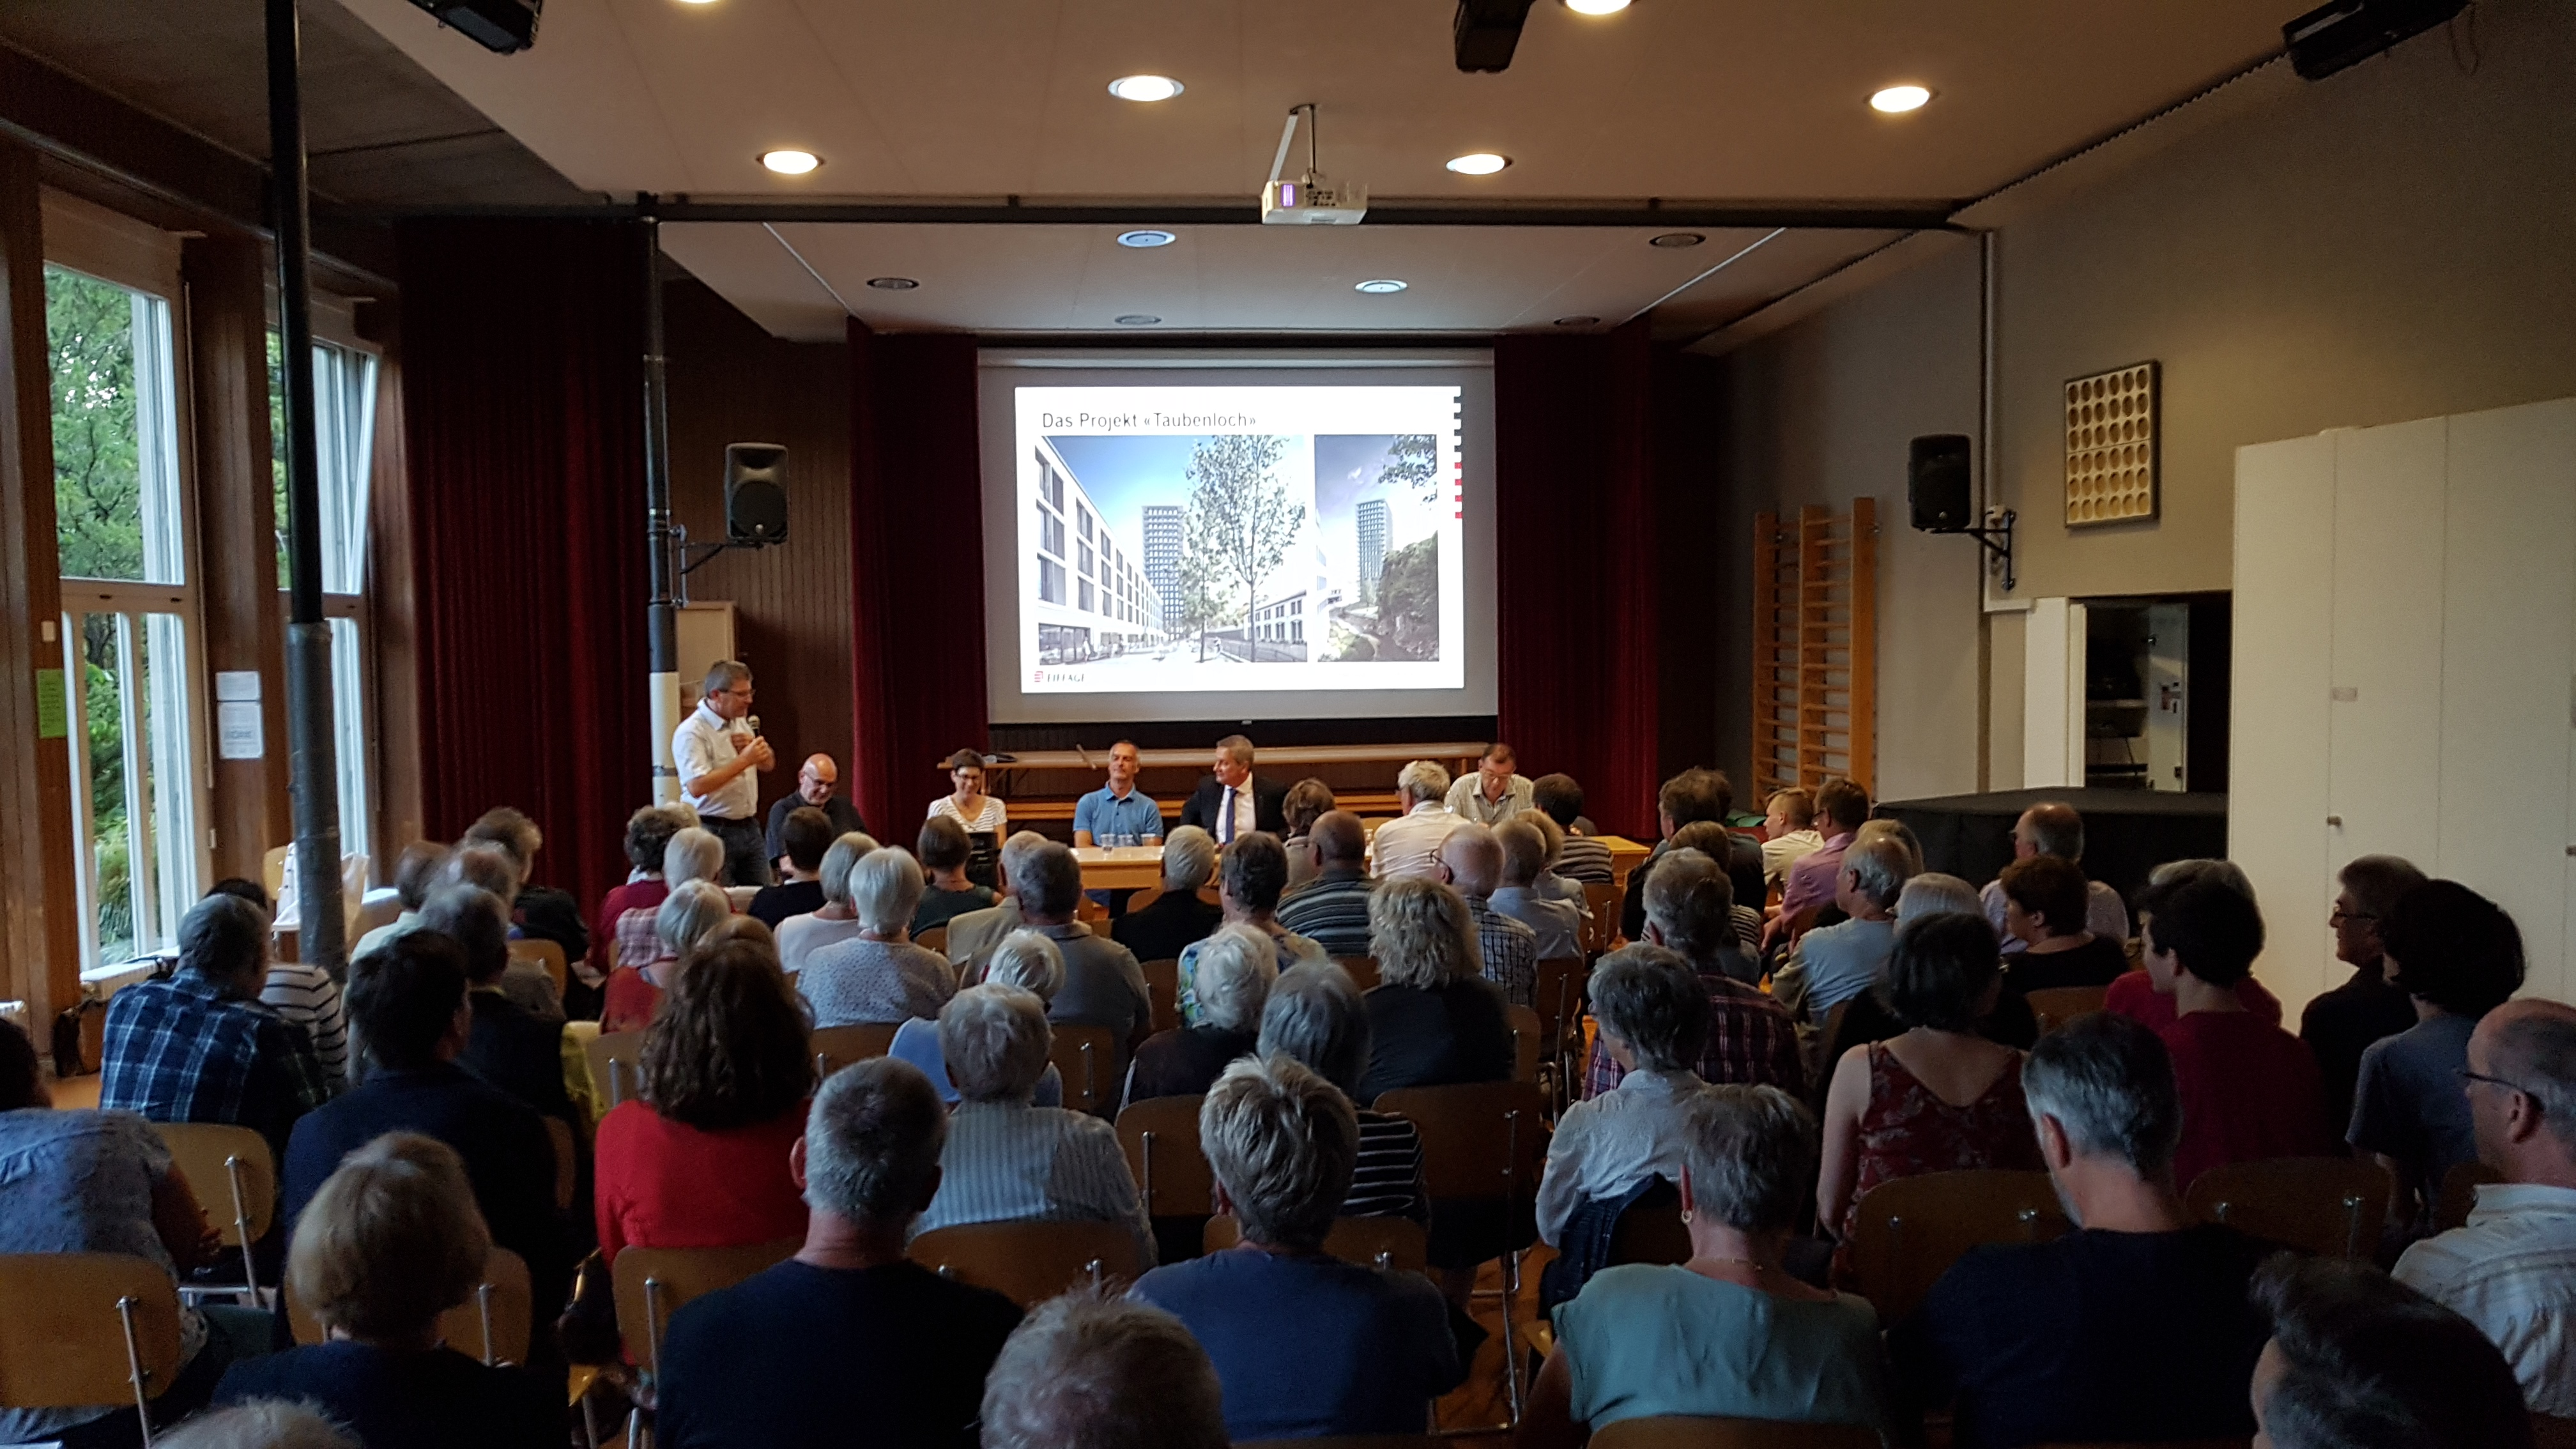 Manifestation d'information des bâtiments au Taubenloch